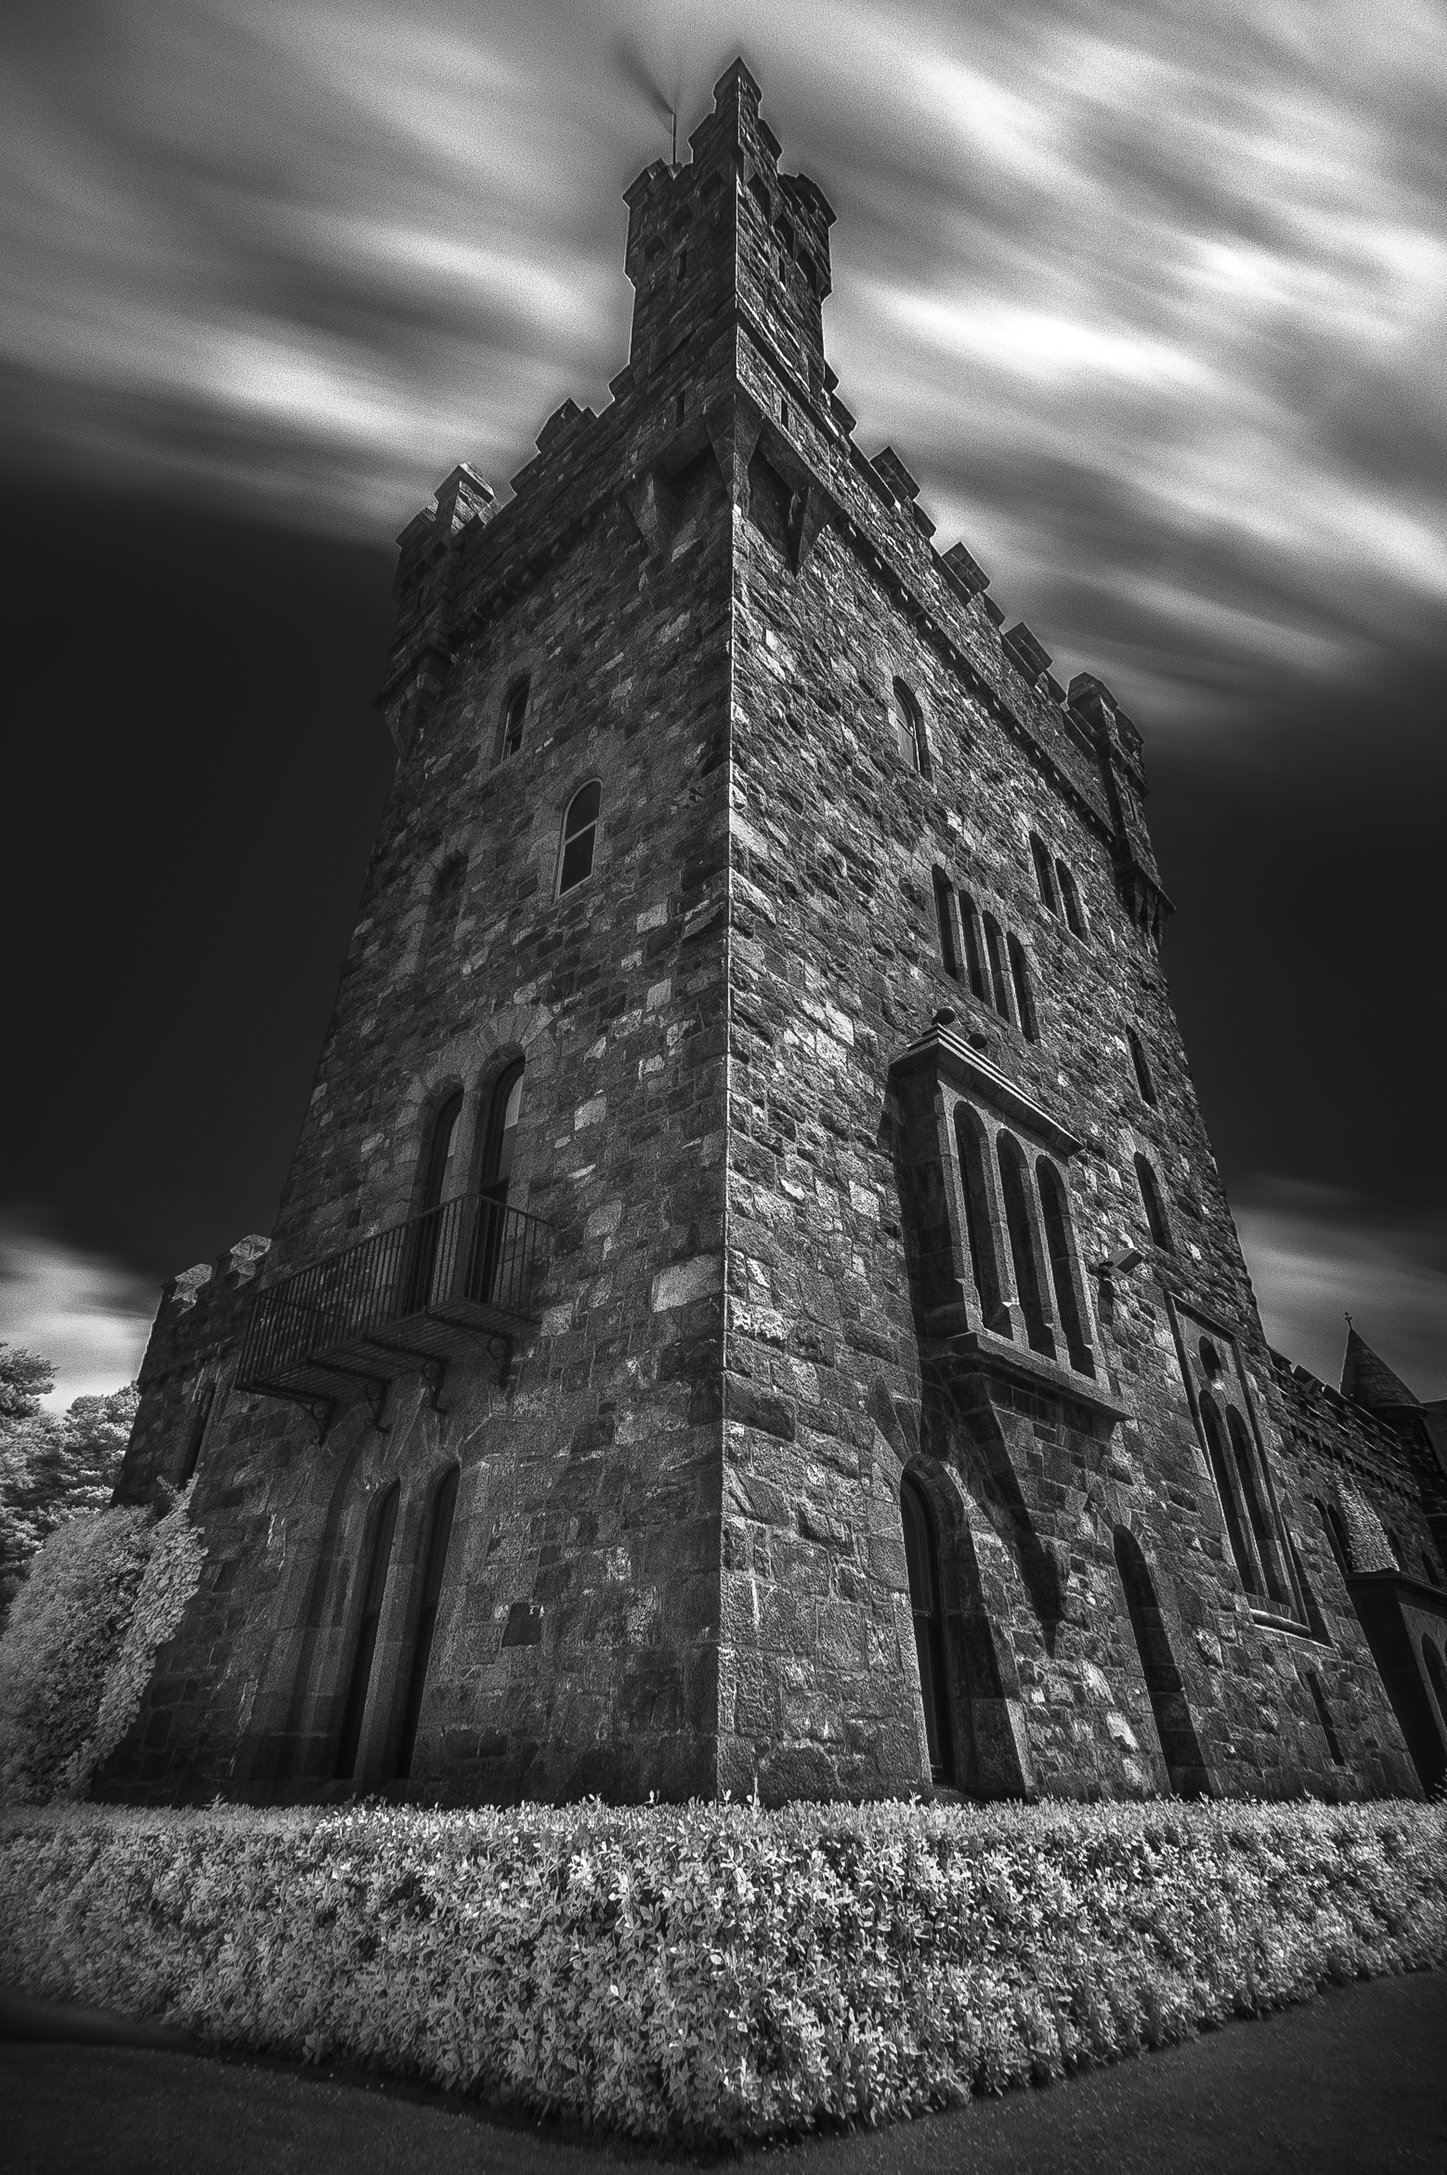 Glenveagh Castle-MASTER COPY.jpg